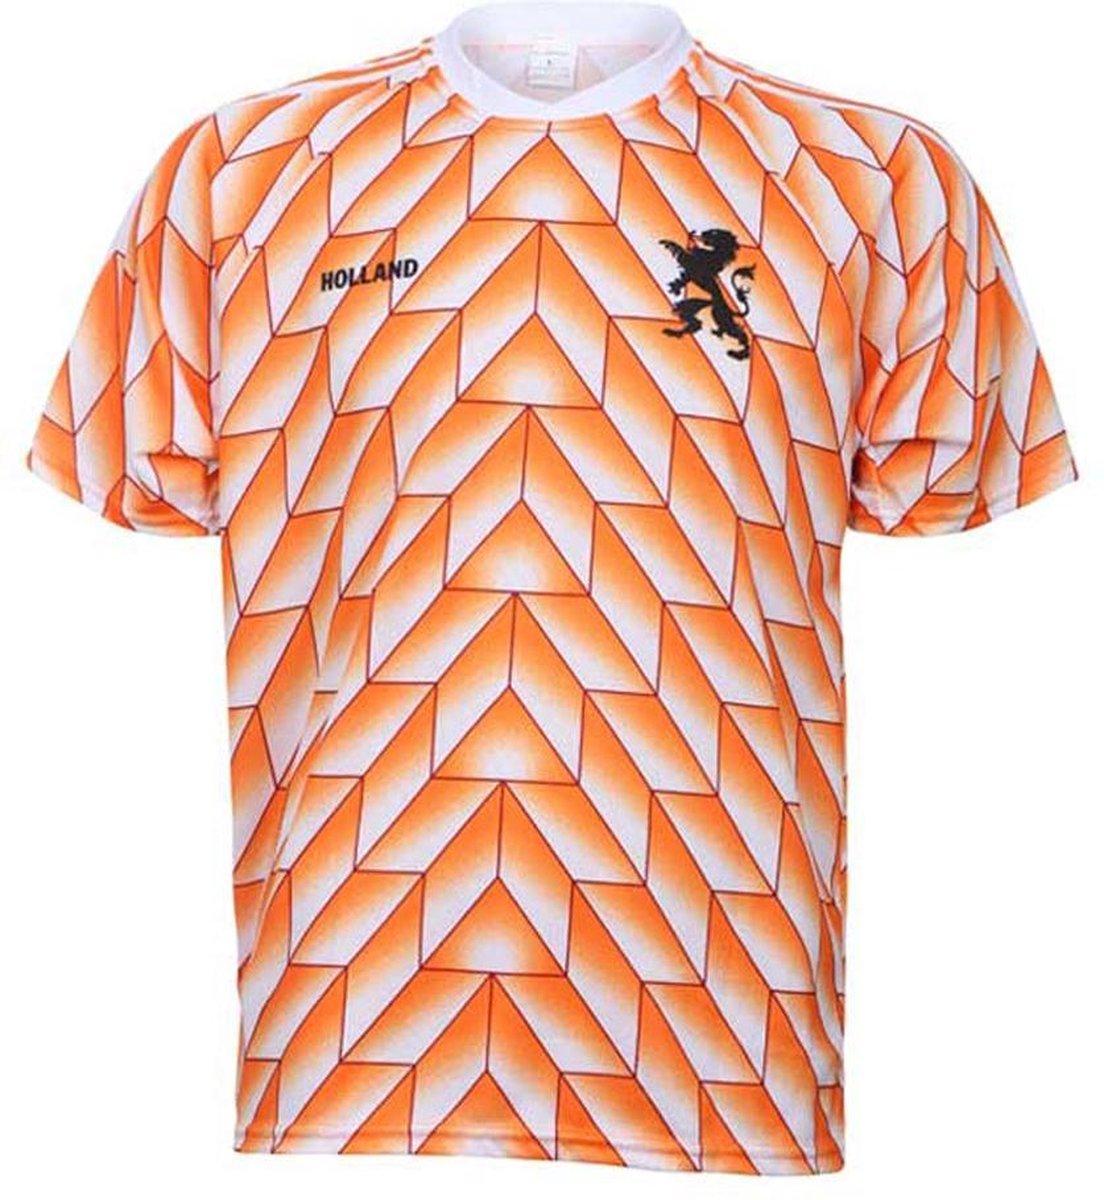 EK 88 Voetbalshirt 1988 Blanco-XL